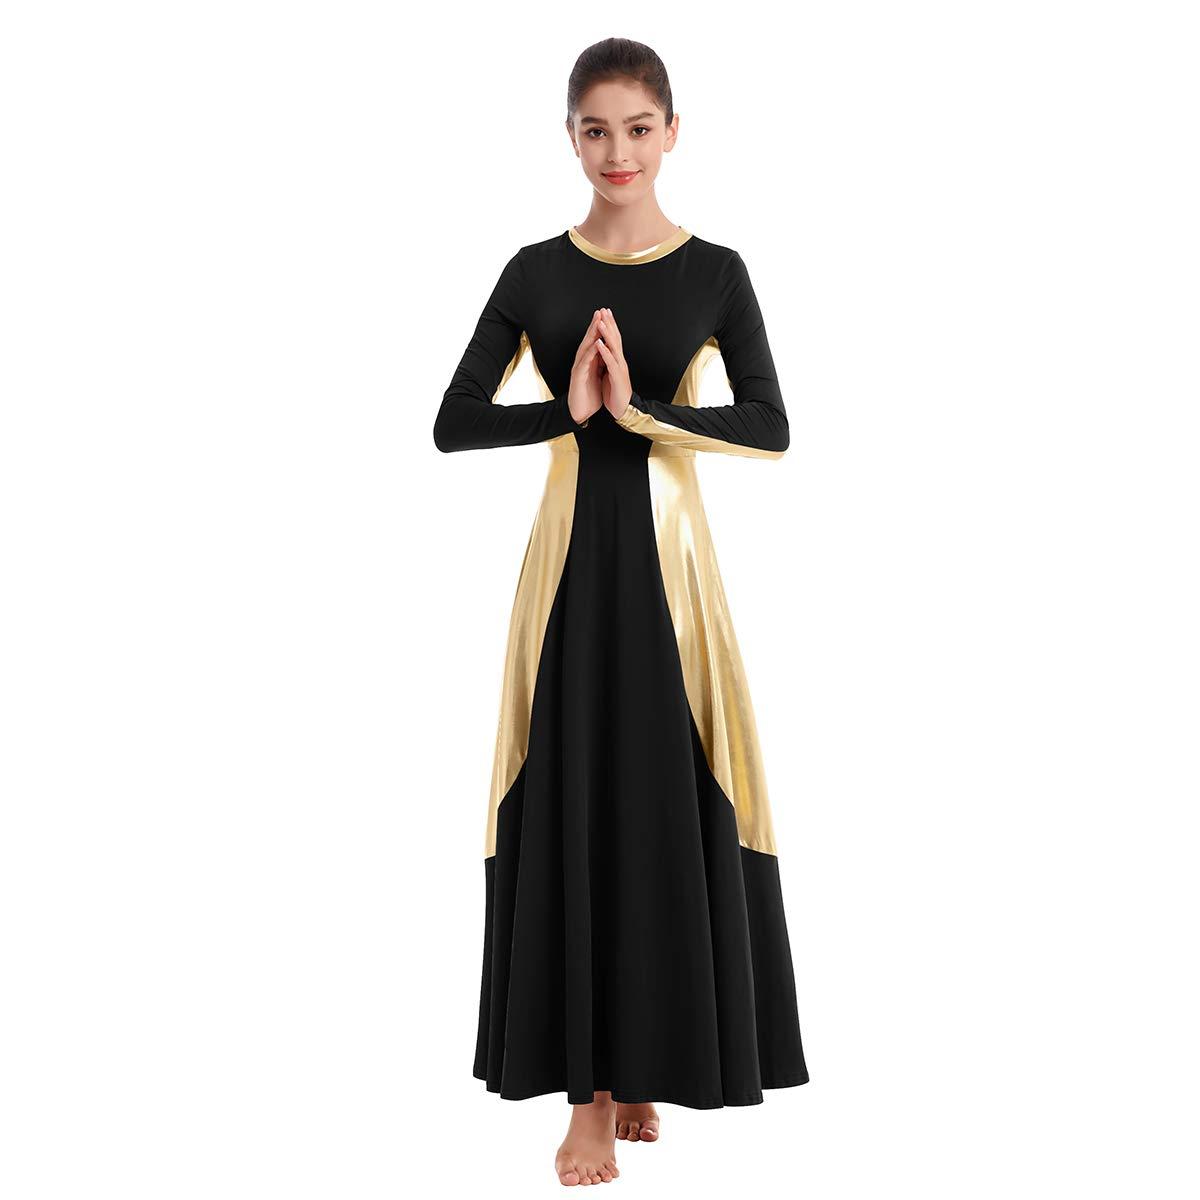 Women Praise Dance Robe Liturgical Worship Metallic Color Block Long Sleeve Maxi Joyful Dress Loose Fit Full Length Costume Ballet Swing Gown Black-Gold S by IBAKOM